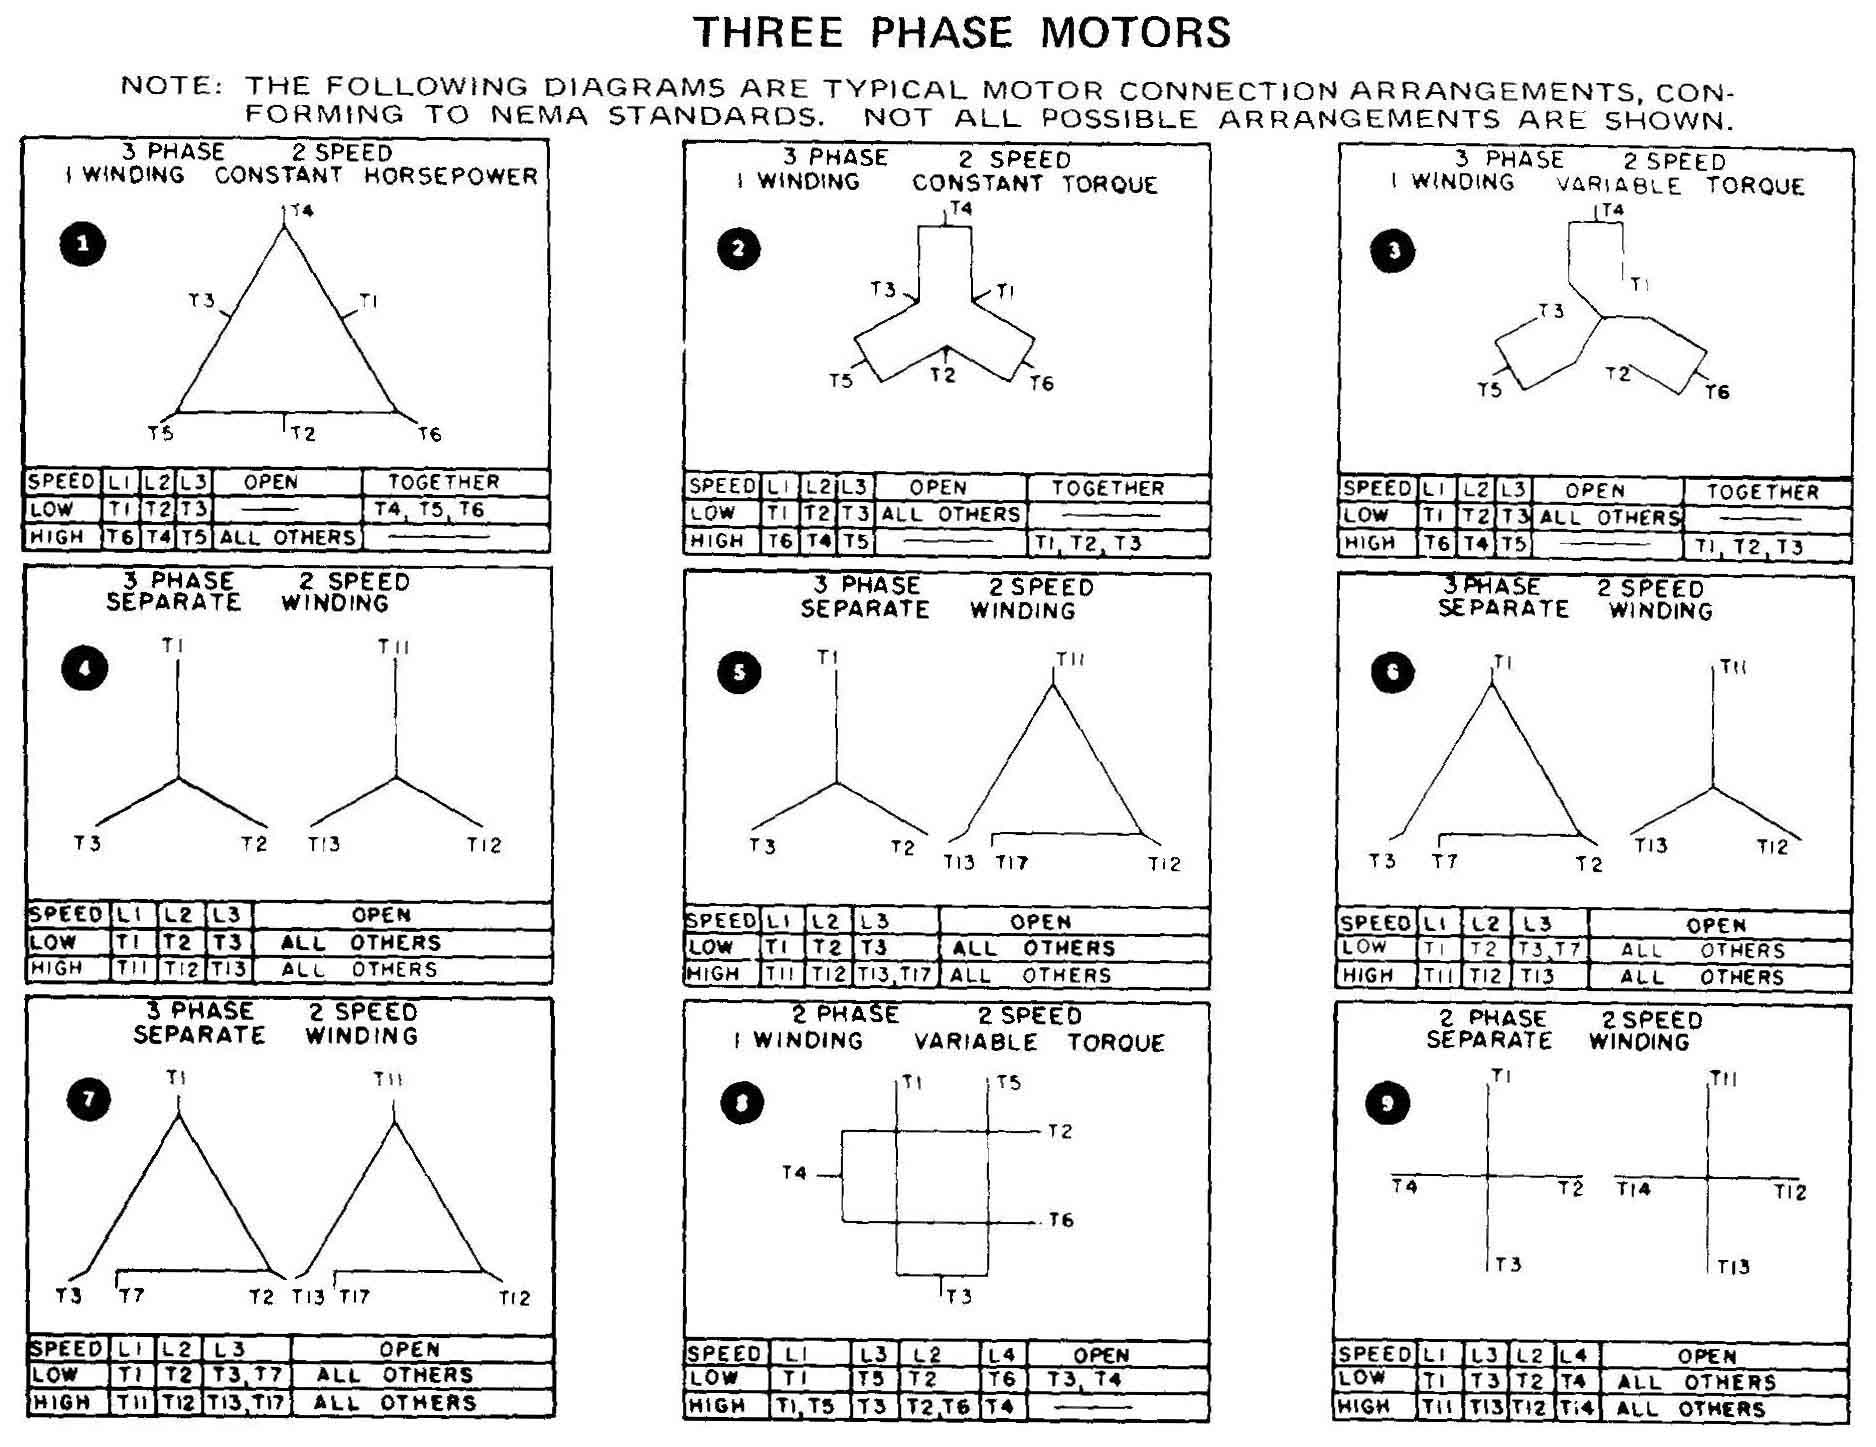 480 Vac Wiring Diagram 120 208 220 Ac Motor Electrical Diagrams On